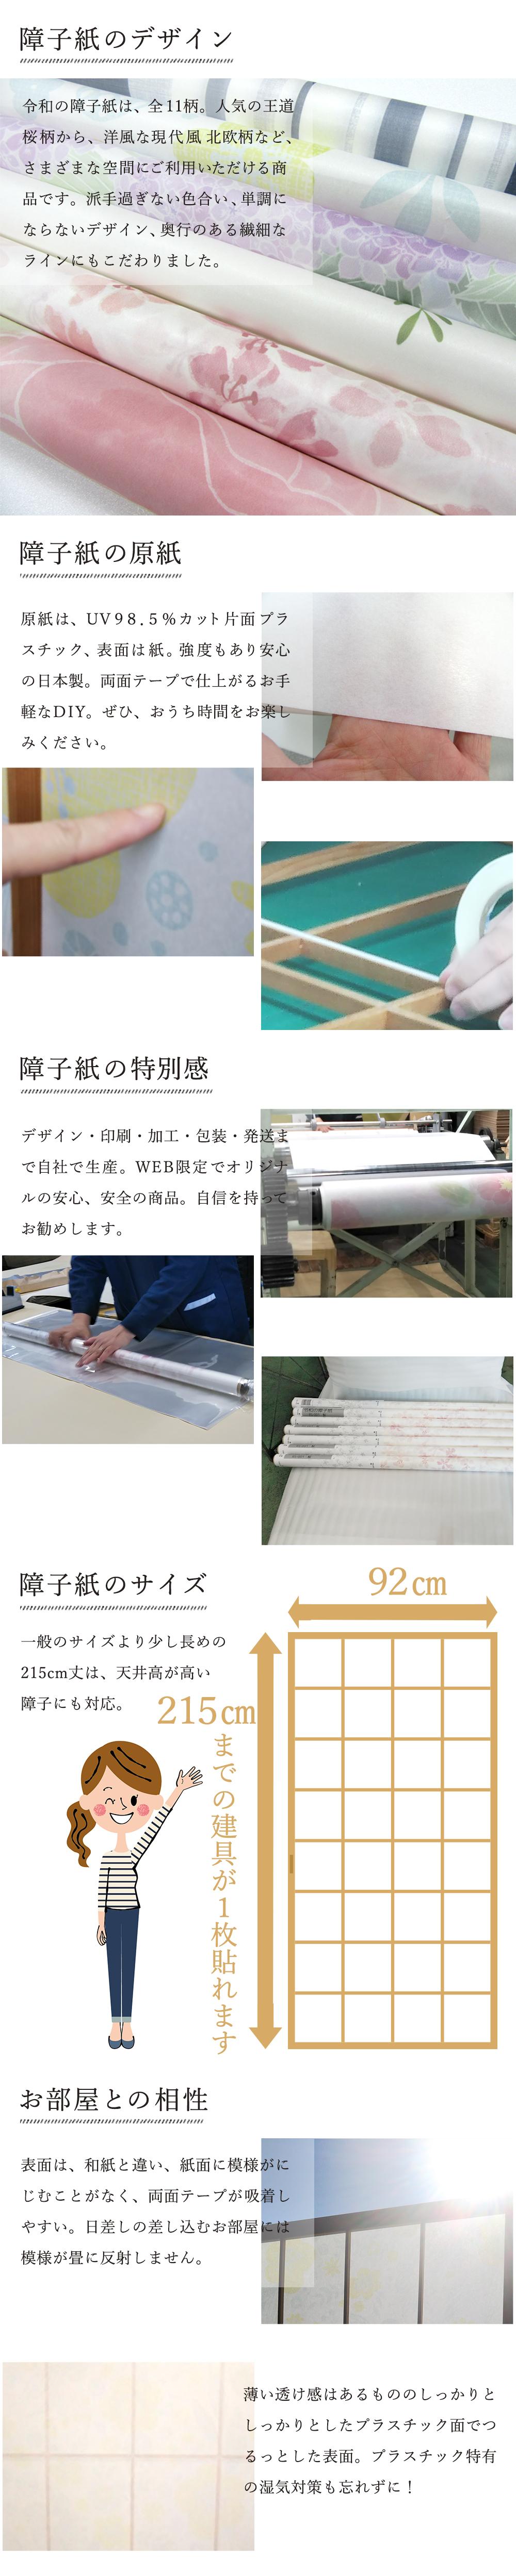 令和の障子紙 商品説明